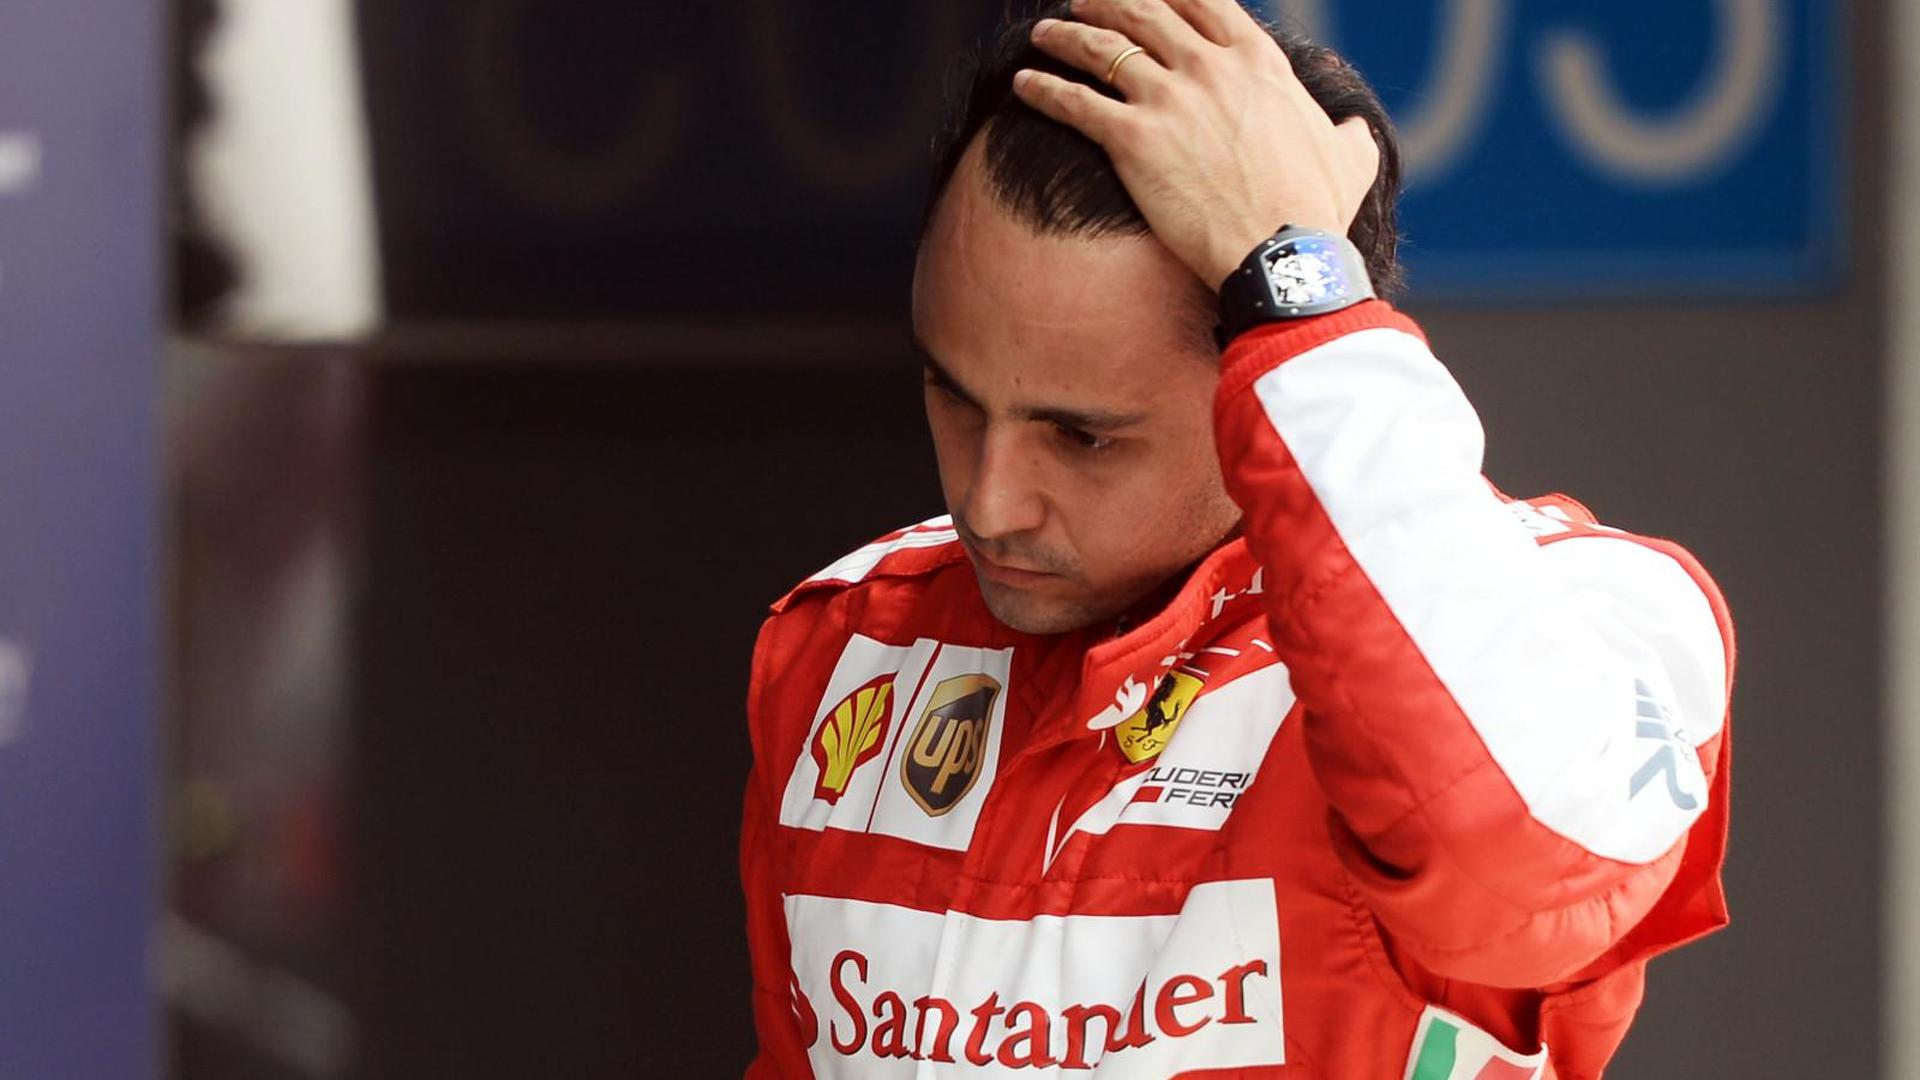 Massa went against advised Ferrari strategy